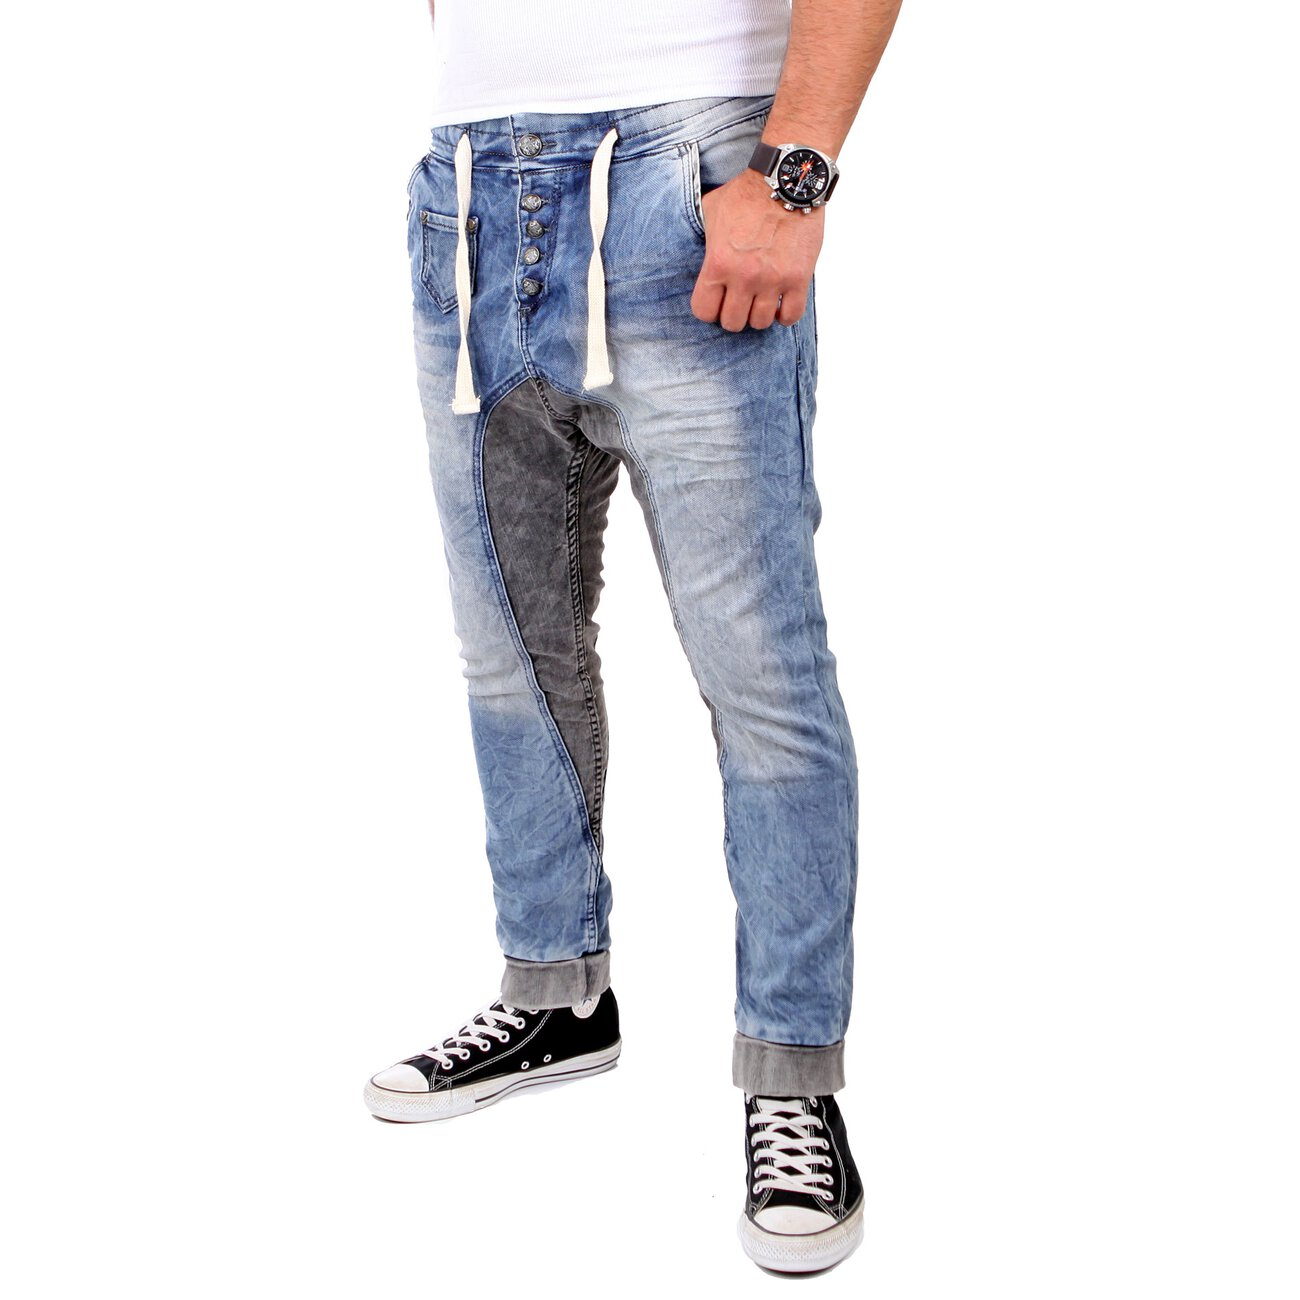 rerock jogg jeans herren bicolor low crotch jogginghose. Black Bedroom Furniture Sets. Home Design Ideas